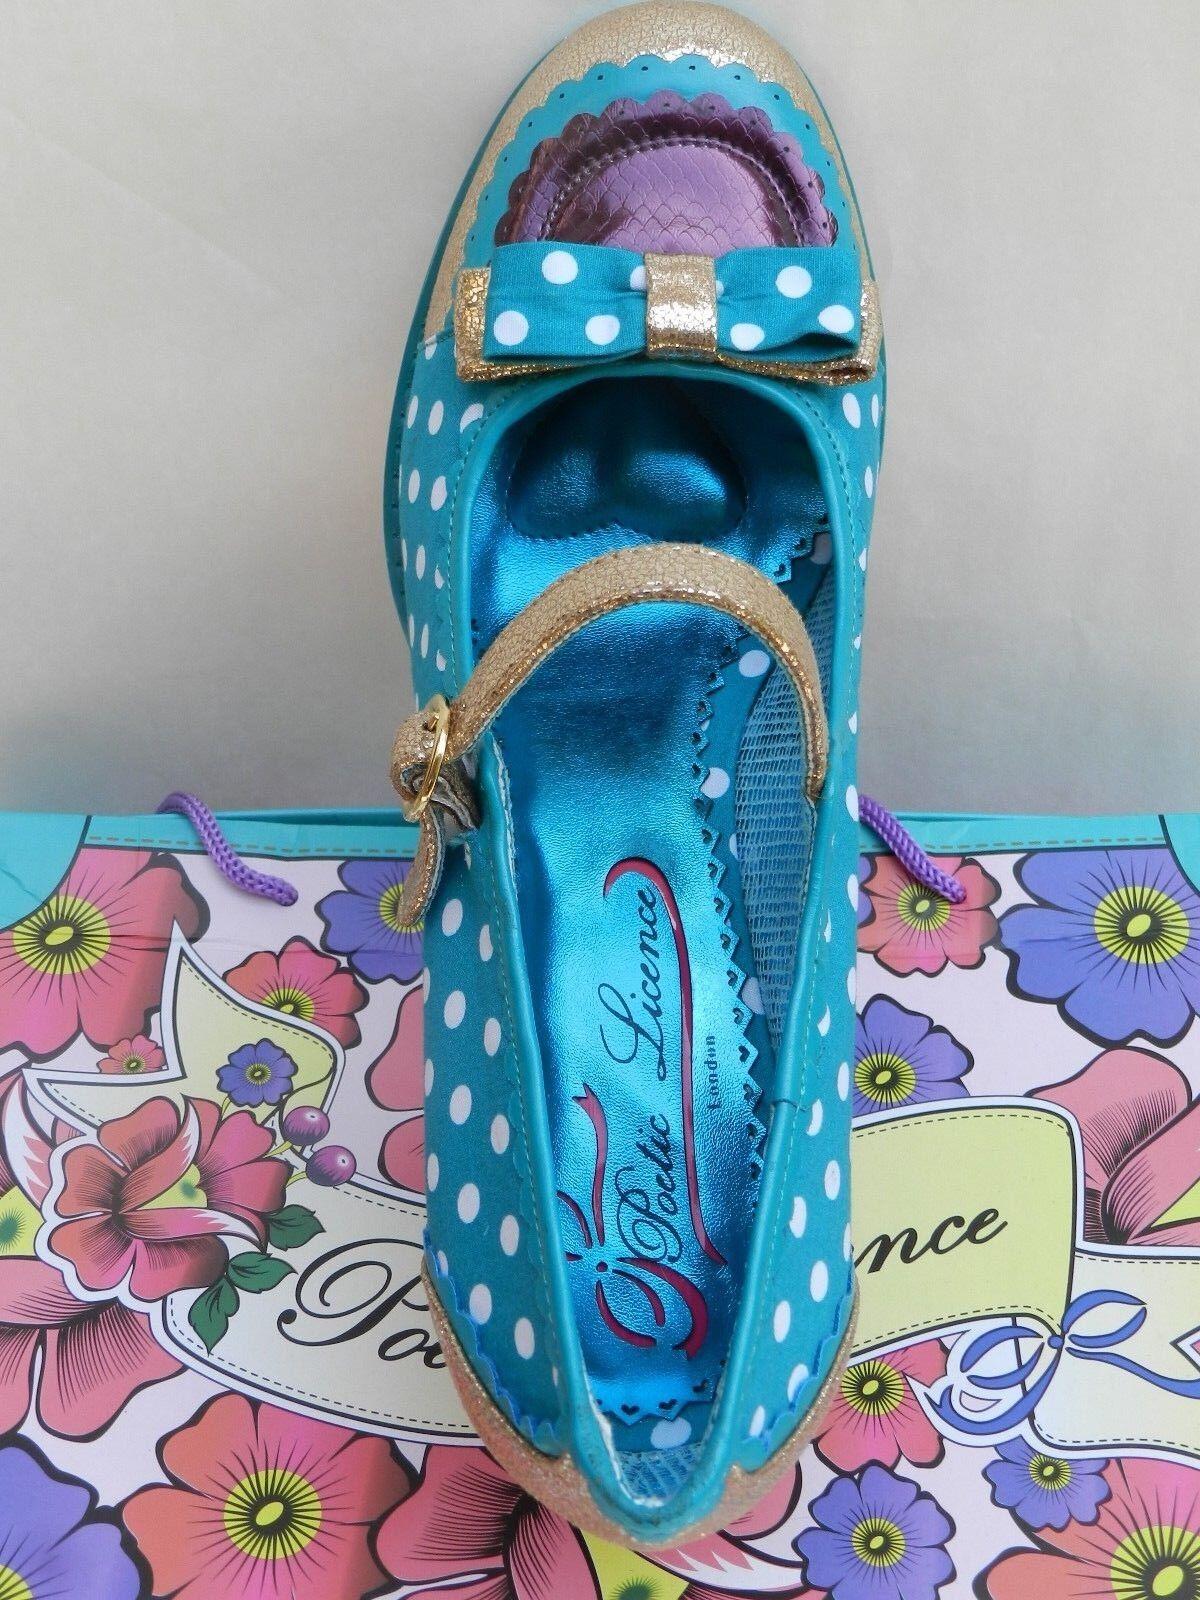 shoes Femme 41 Poetic Licence Final Whistle Whistle Whistle Mary Jane Irregular Choice Neuf da4c21